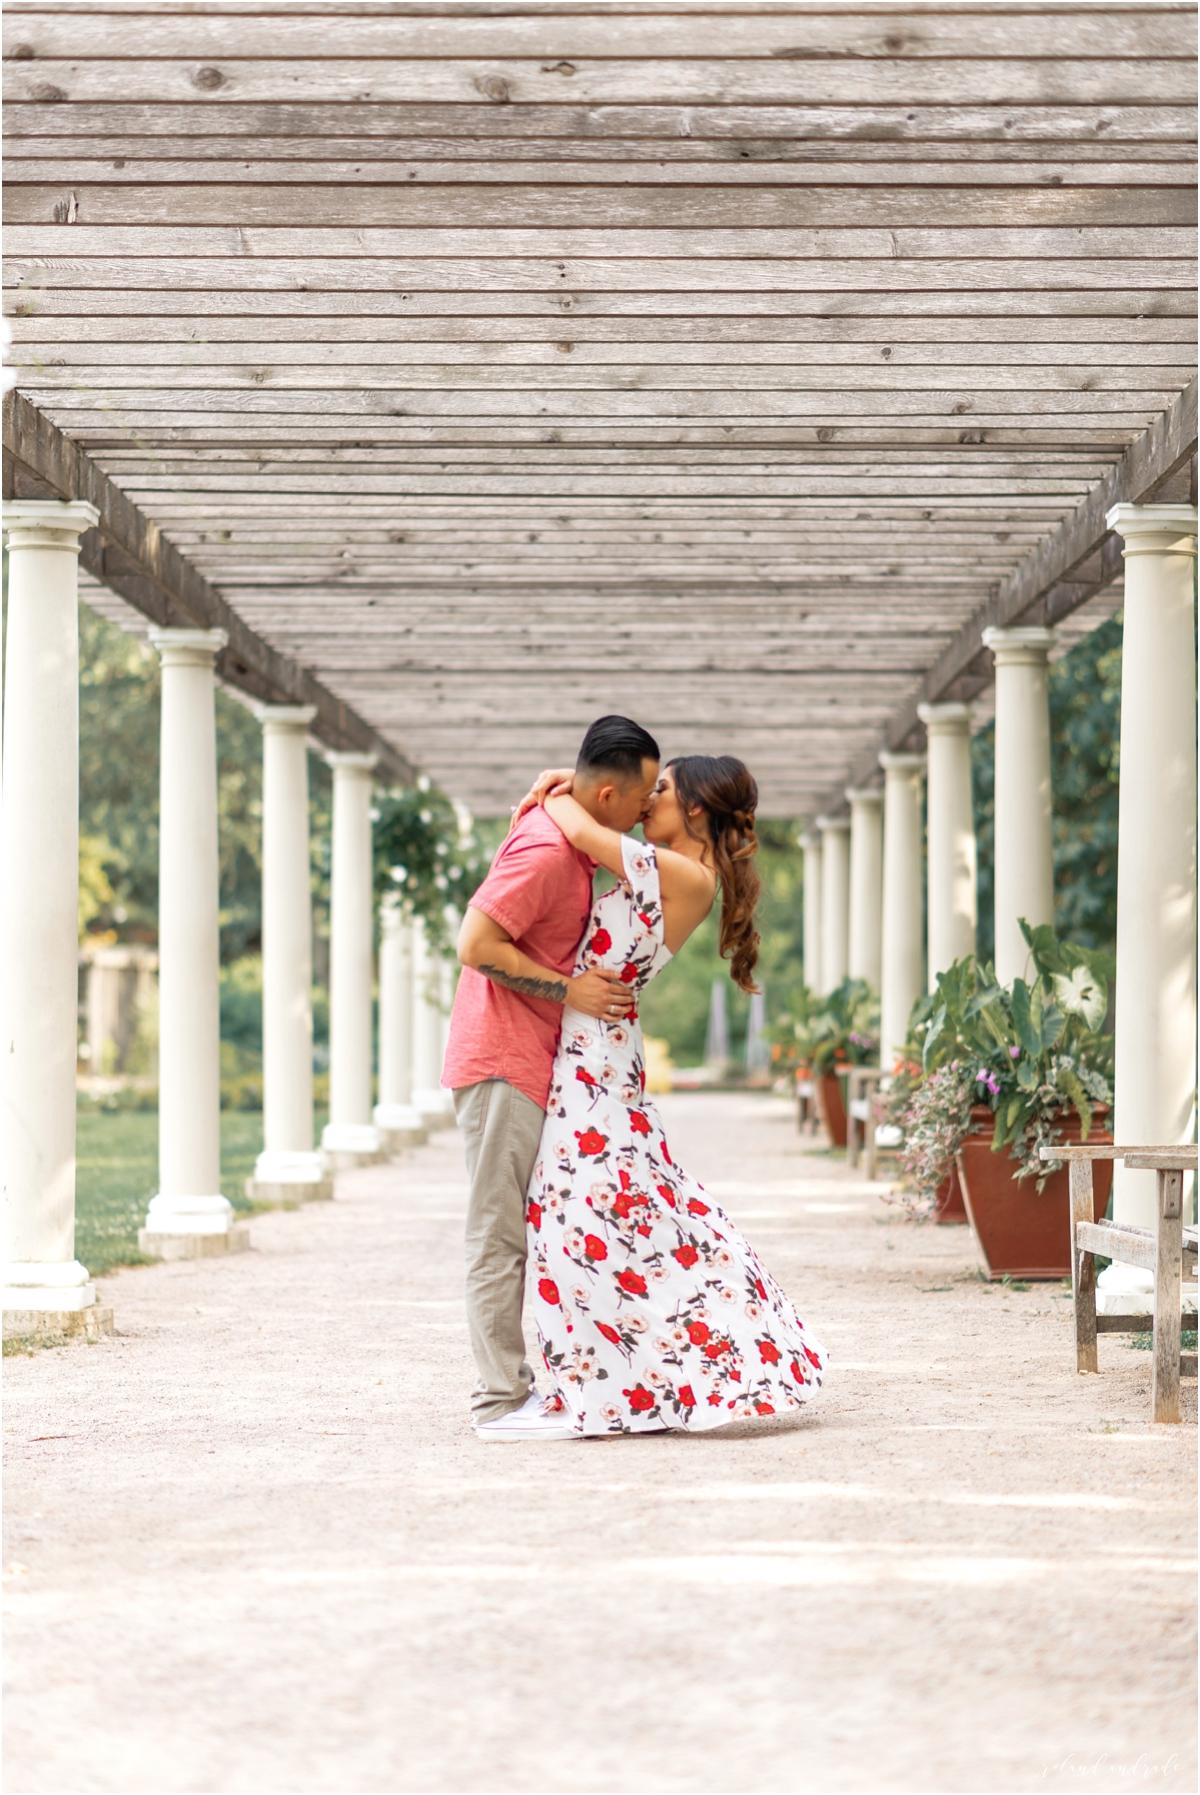 Cantigny Park Engagement Session, Wheaton Illinois Engagement Session, Chicago Wedding Photographer, Naperville Wedding Photographer, Aurora Wedding Photographer_0010.jpg